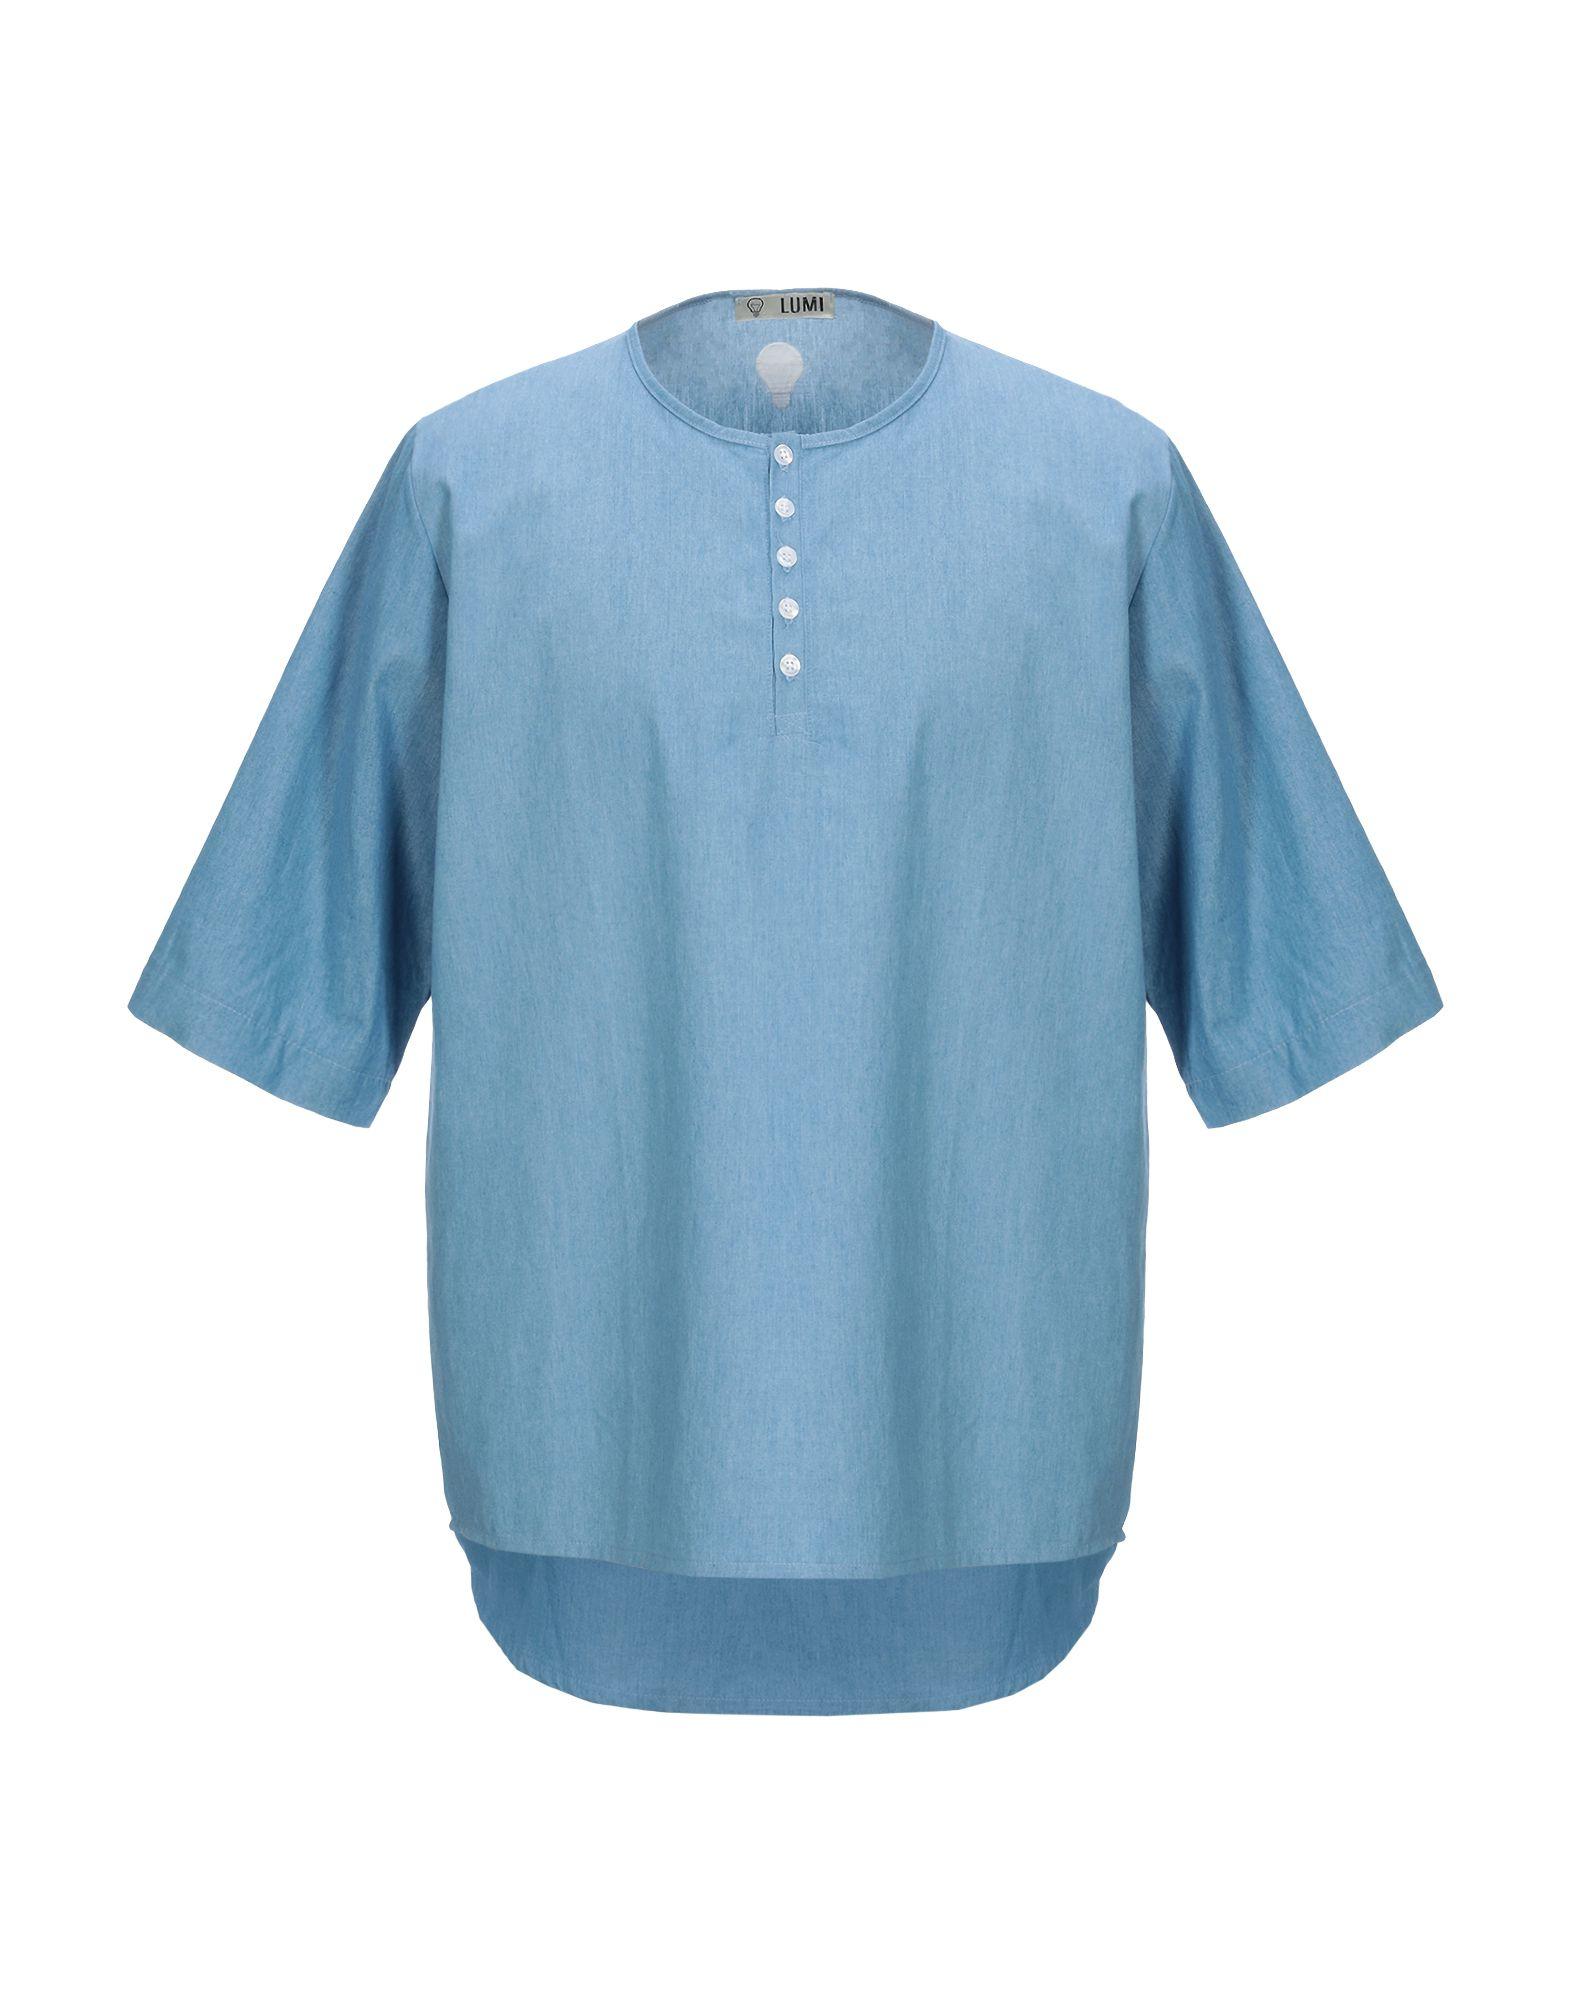 цена на LUMI Джинсовая рубашка